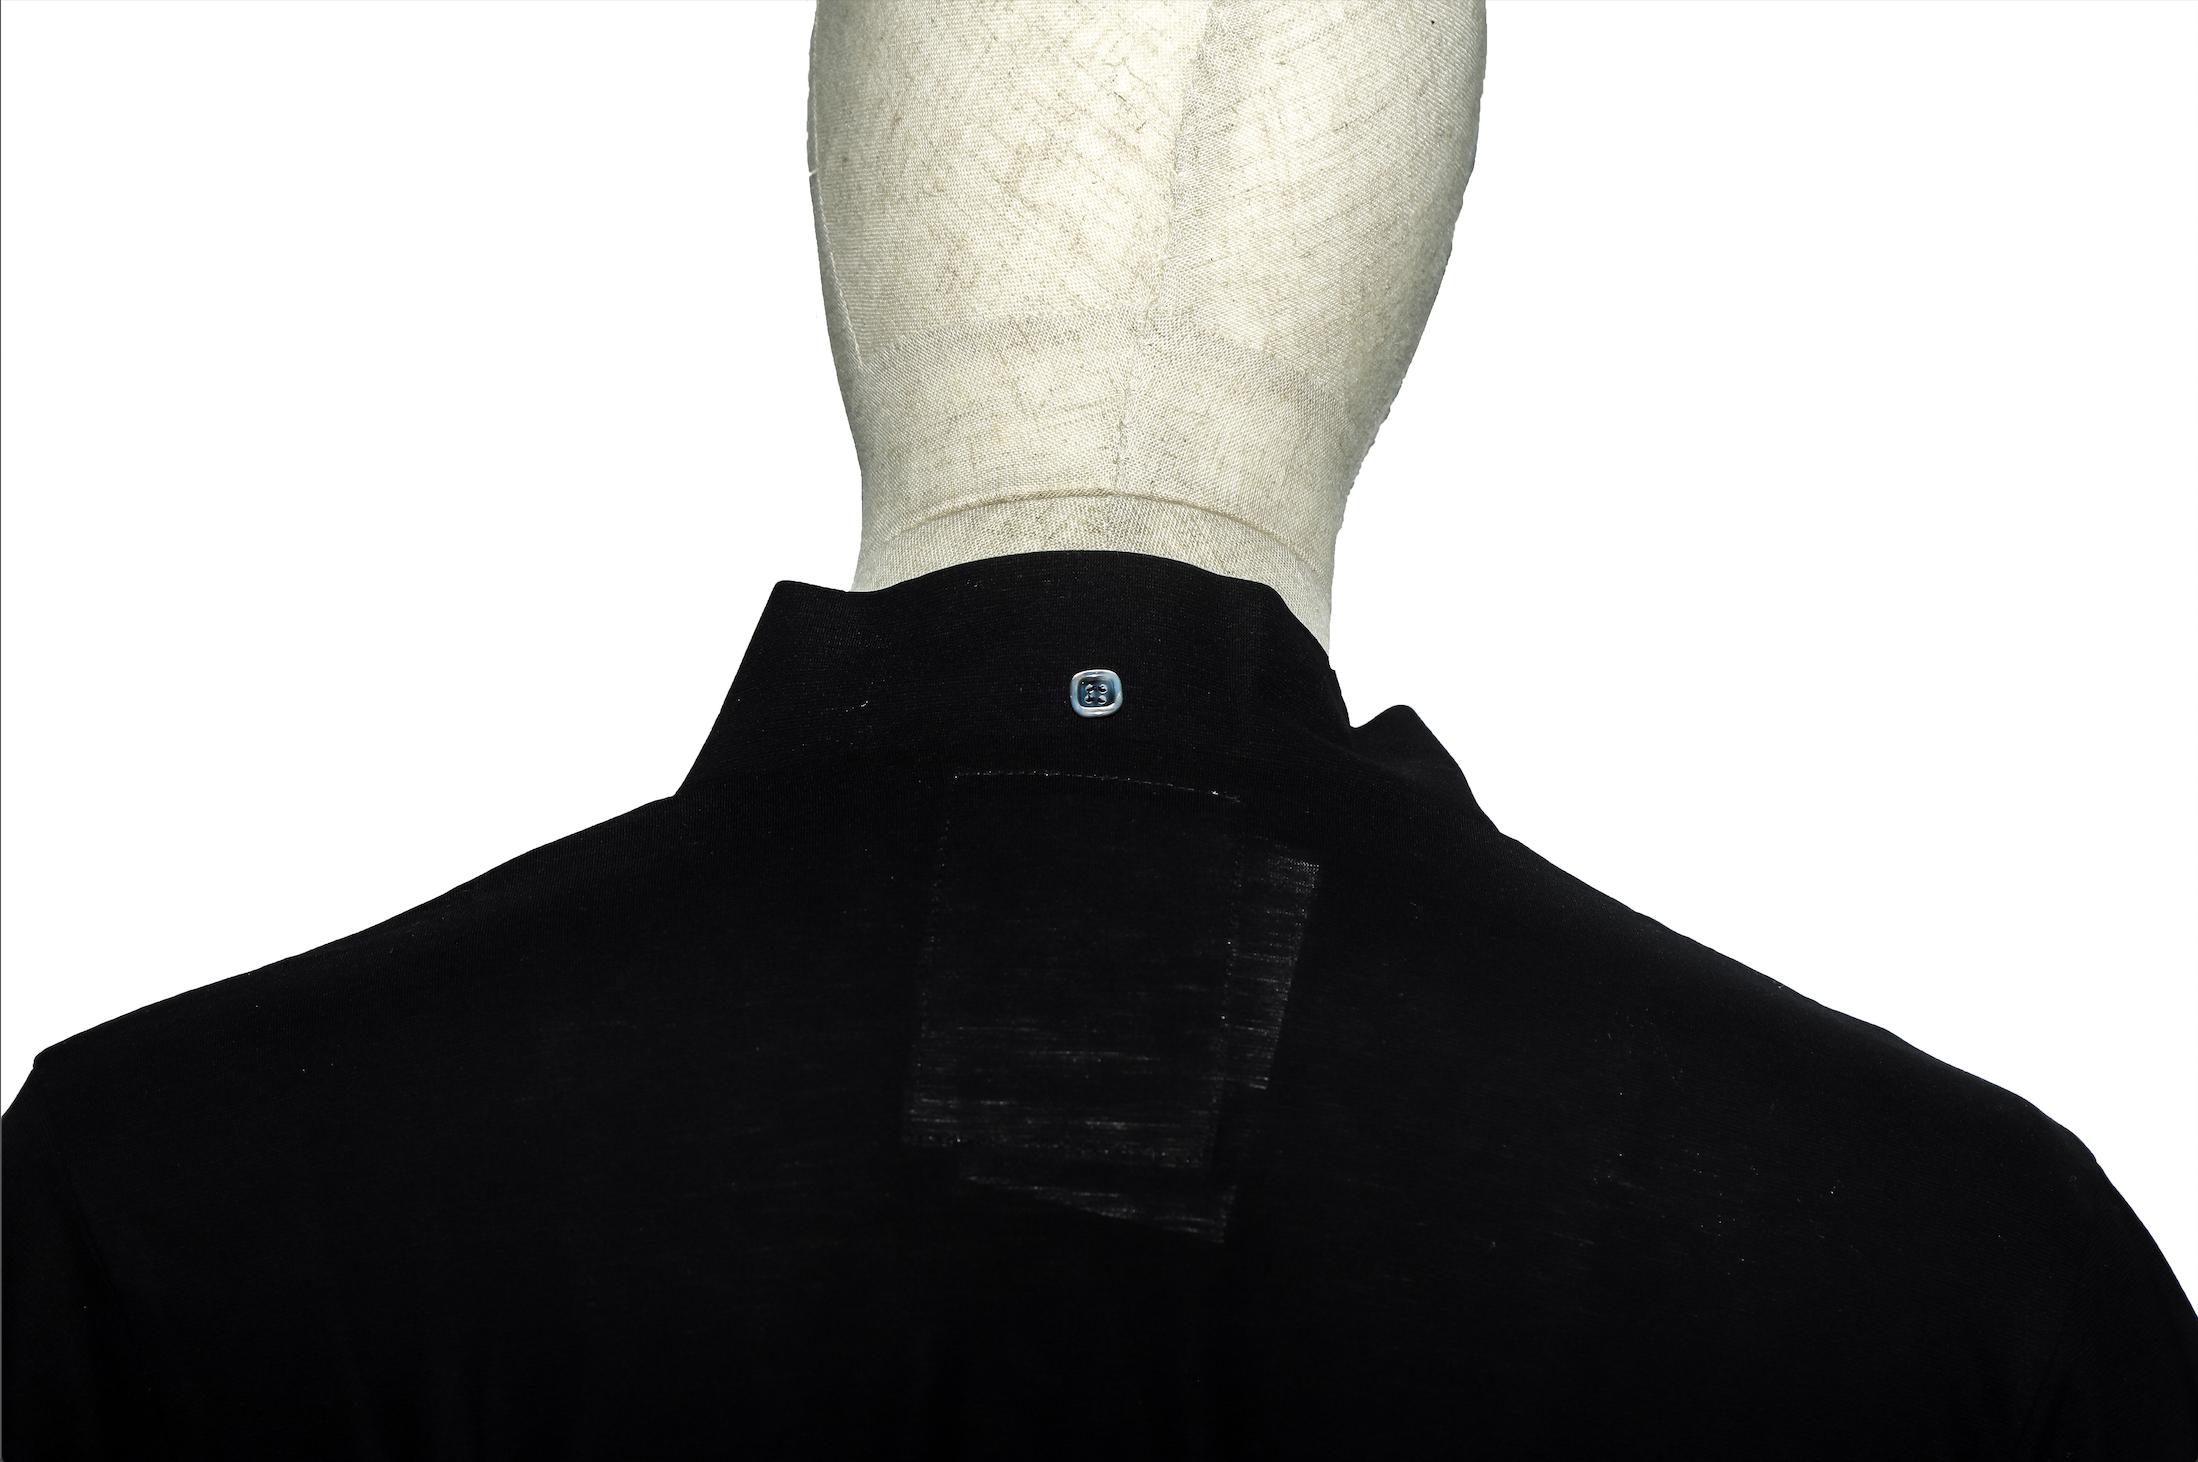 Tシャツ襦袢 七分袖